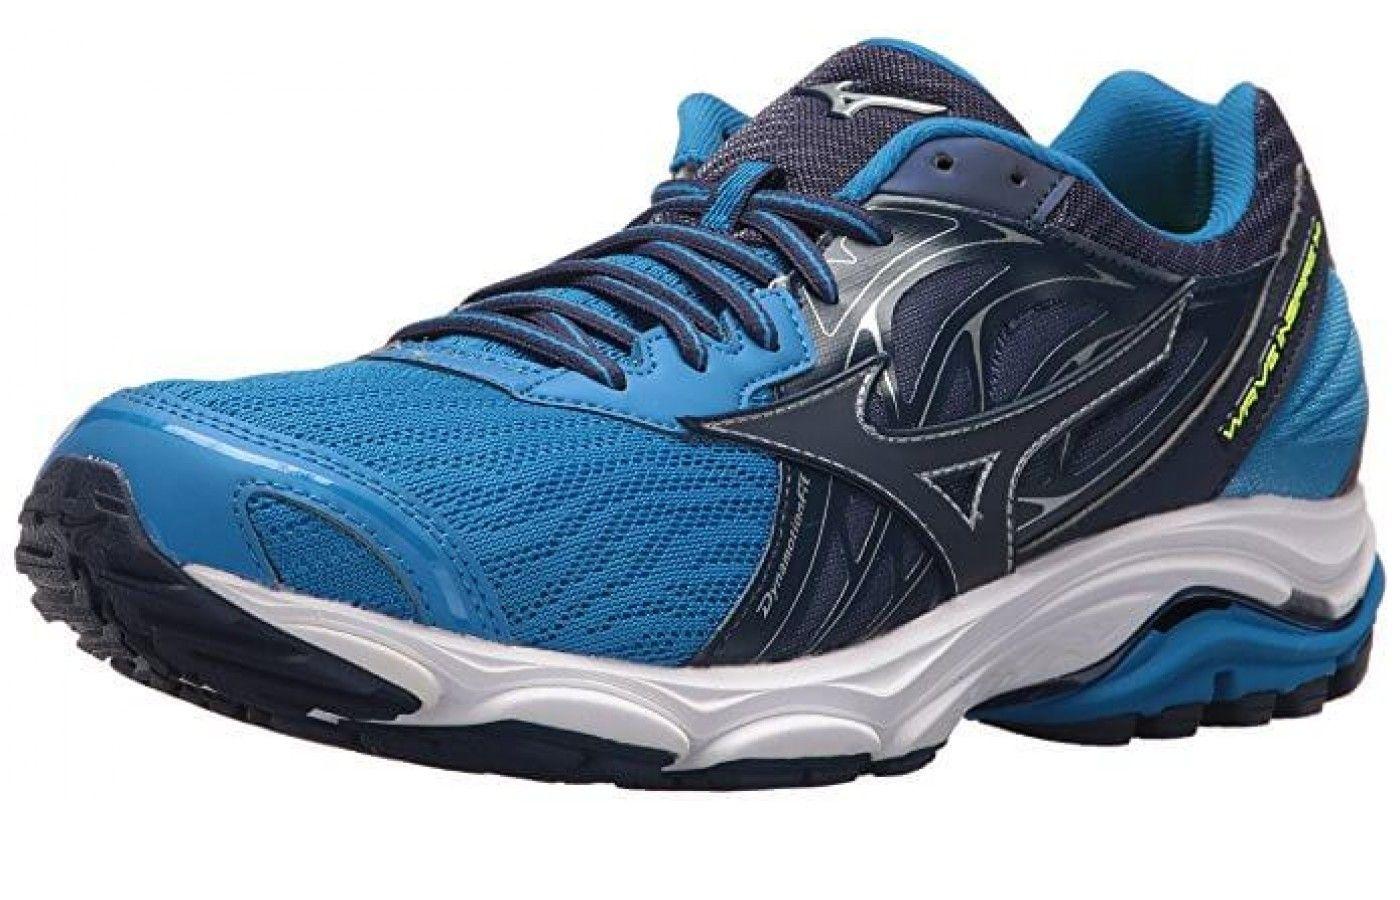 Mizuno Wave Inspire 14 Running Shoes Running Shoe Reviews Best Running Shoes